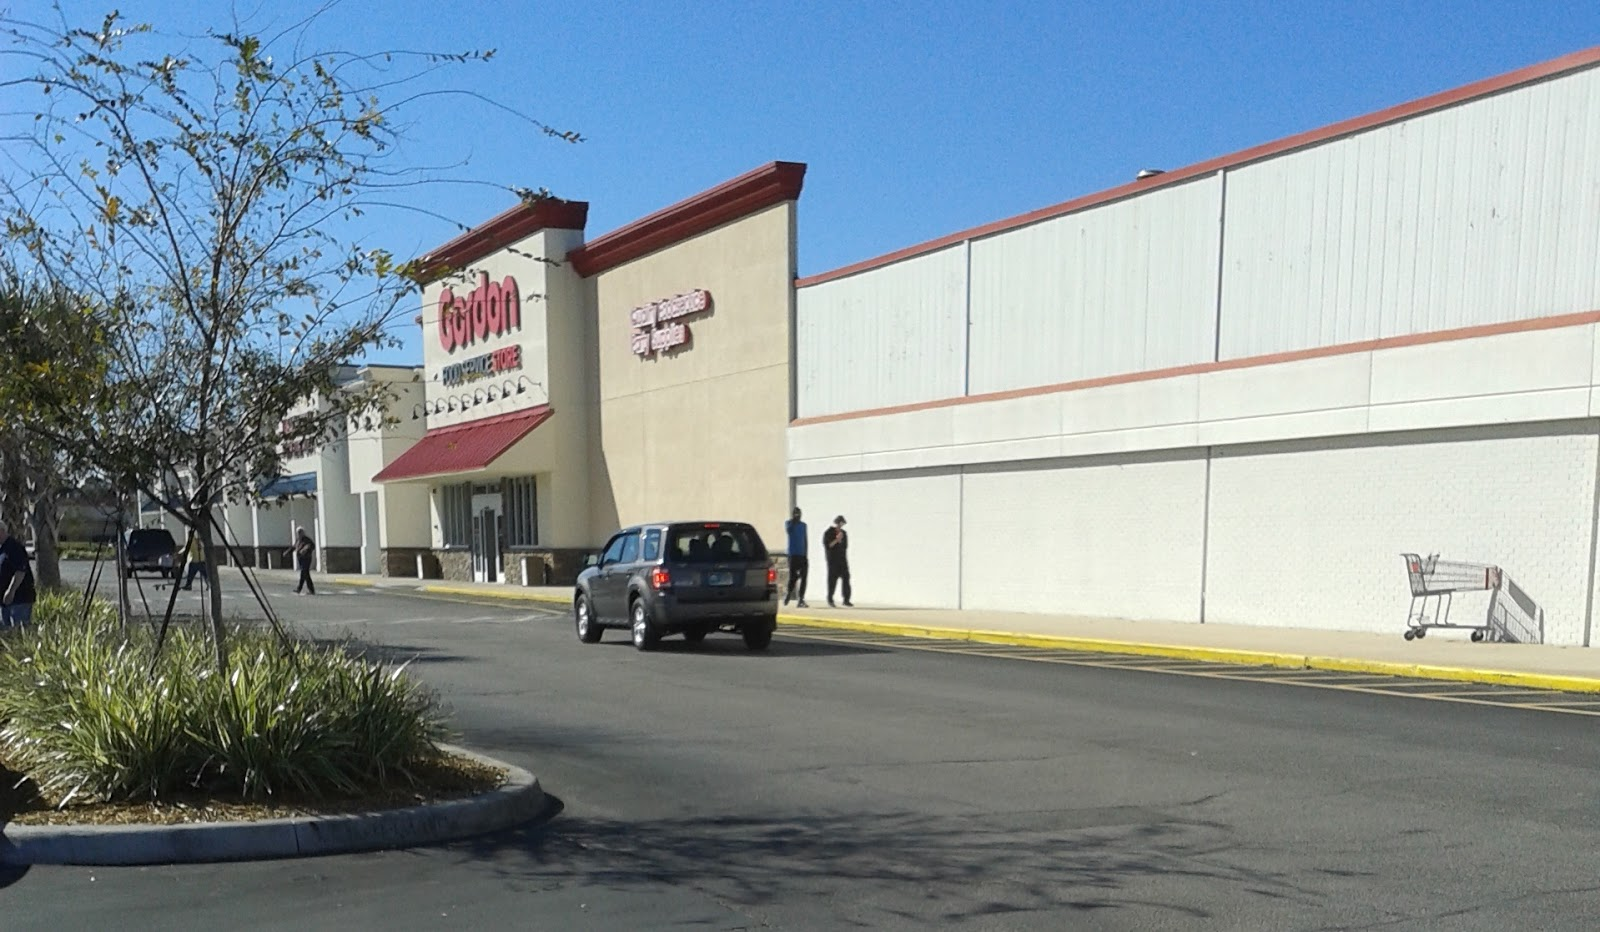 My Florida Retail Blog: Kmart #4415 - Daytona Beach, FL